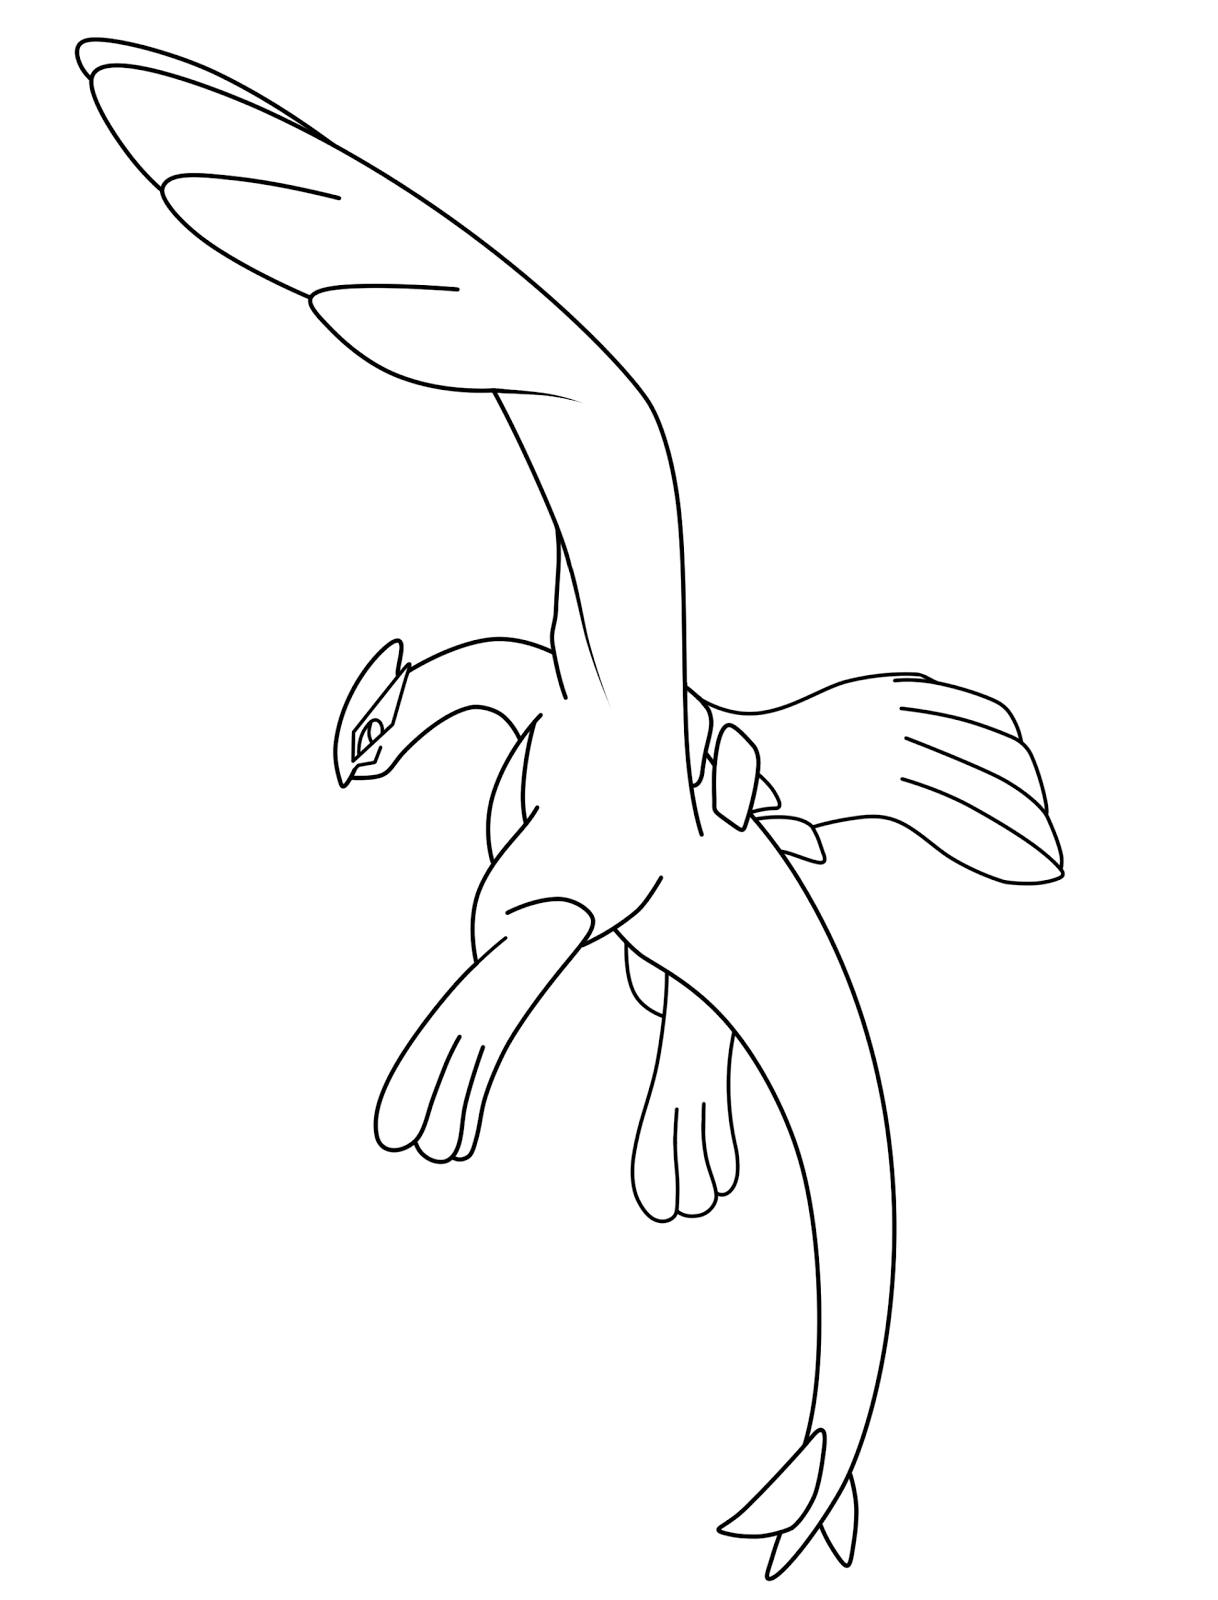 Pokemon Haunter Coloring Page Sketch Coloring Page